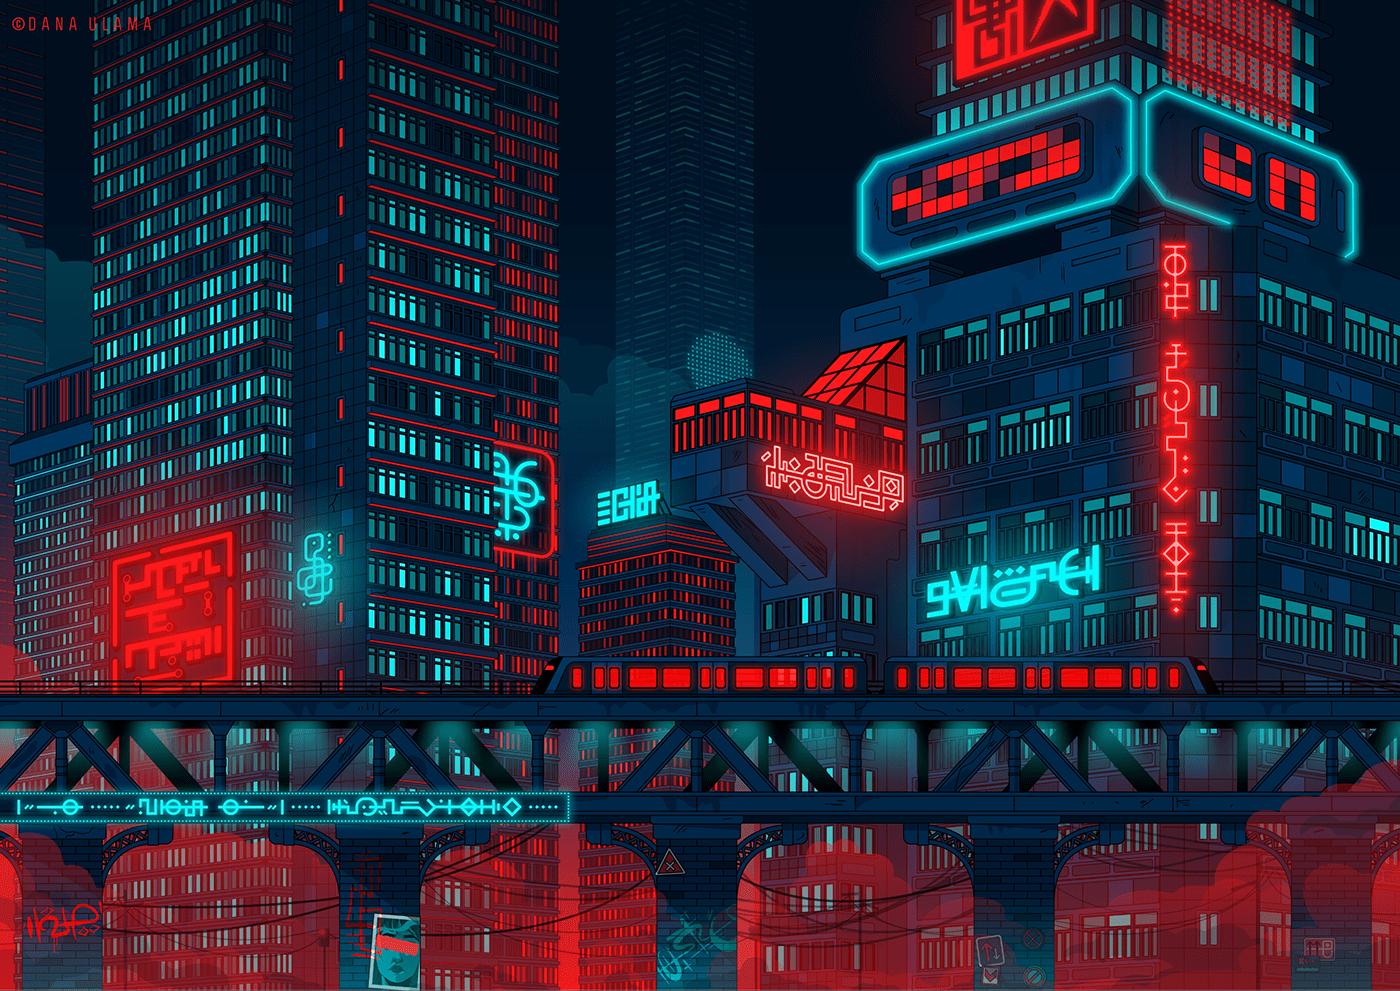 city cityscape Cyberpunk lofi neon retrowave skyline Synthwave Urban vaporwave